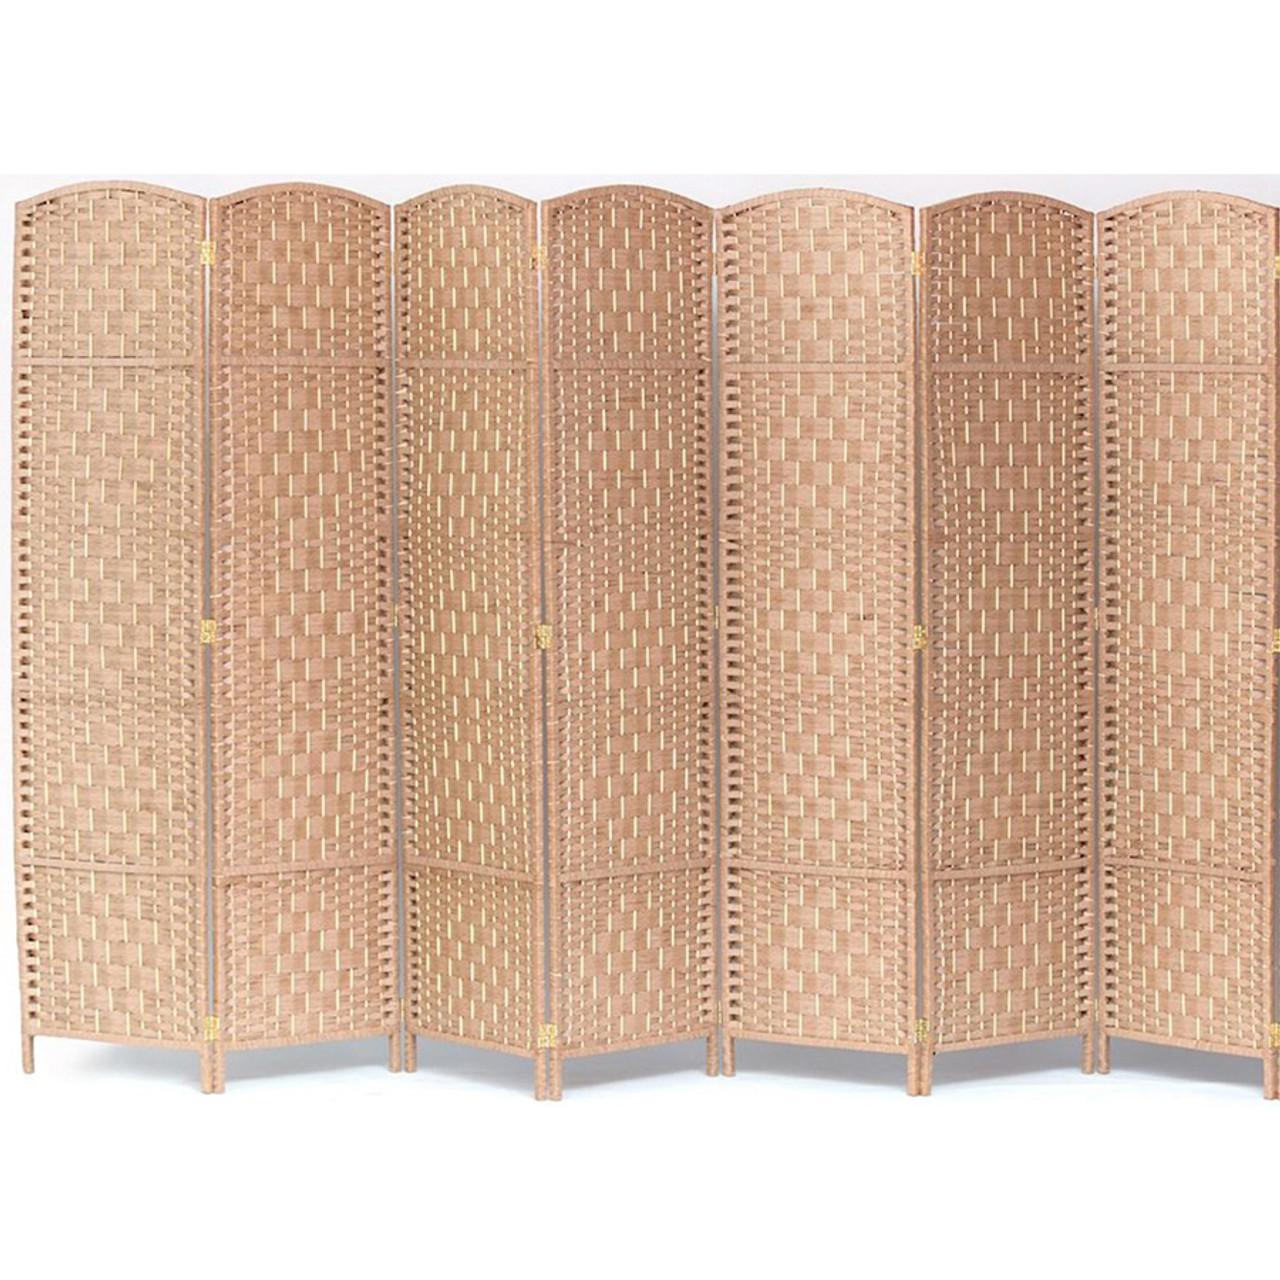 7 Panel Room Divider, Privacy Partition Screen Bamboo Woven Panel in USA, California, NY, New York City, Los Angeles, San Francisco, Pennsylvania, Washington DC, Virginia, Maryland